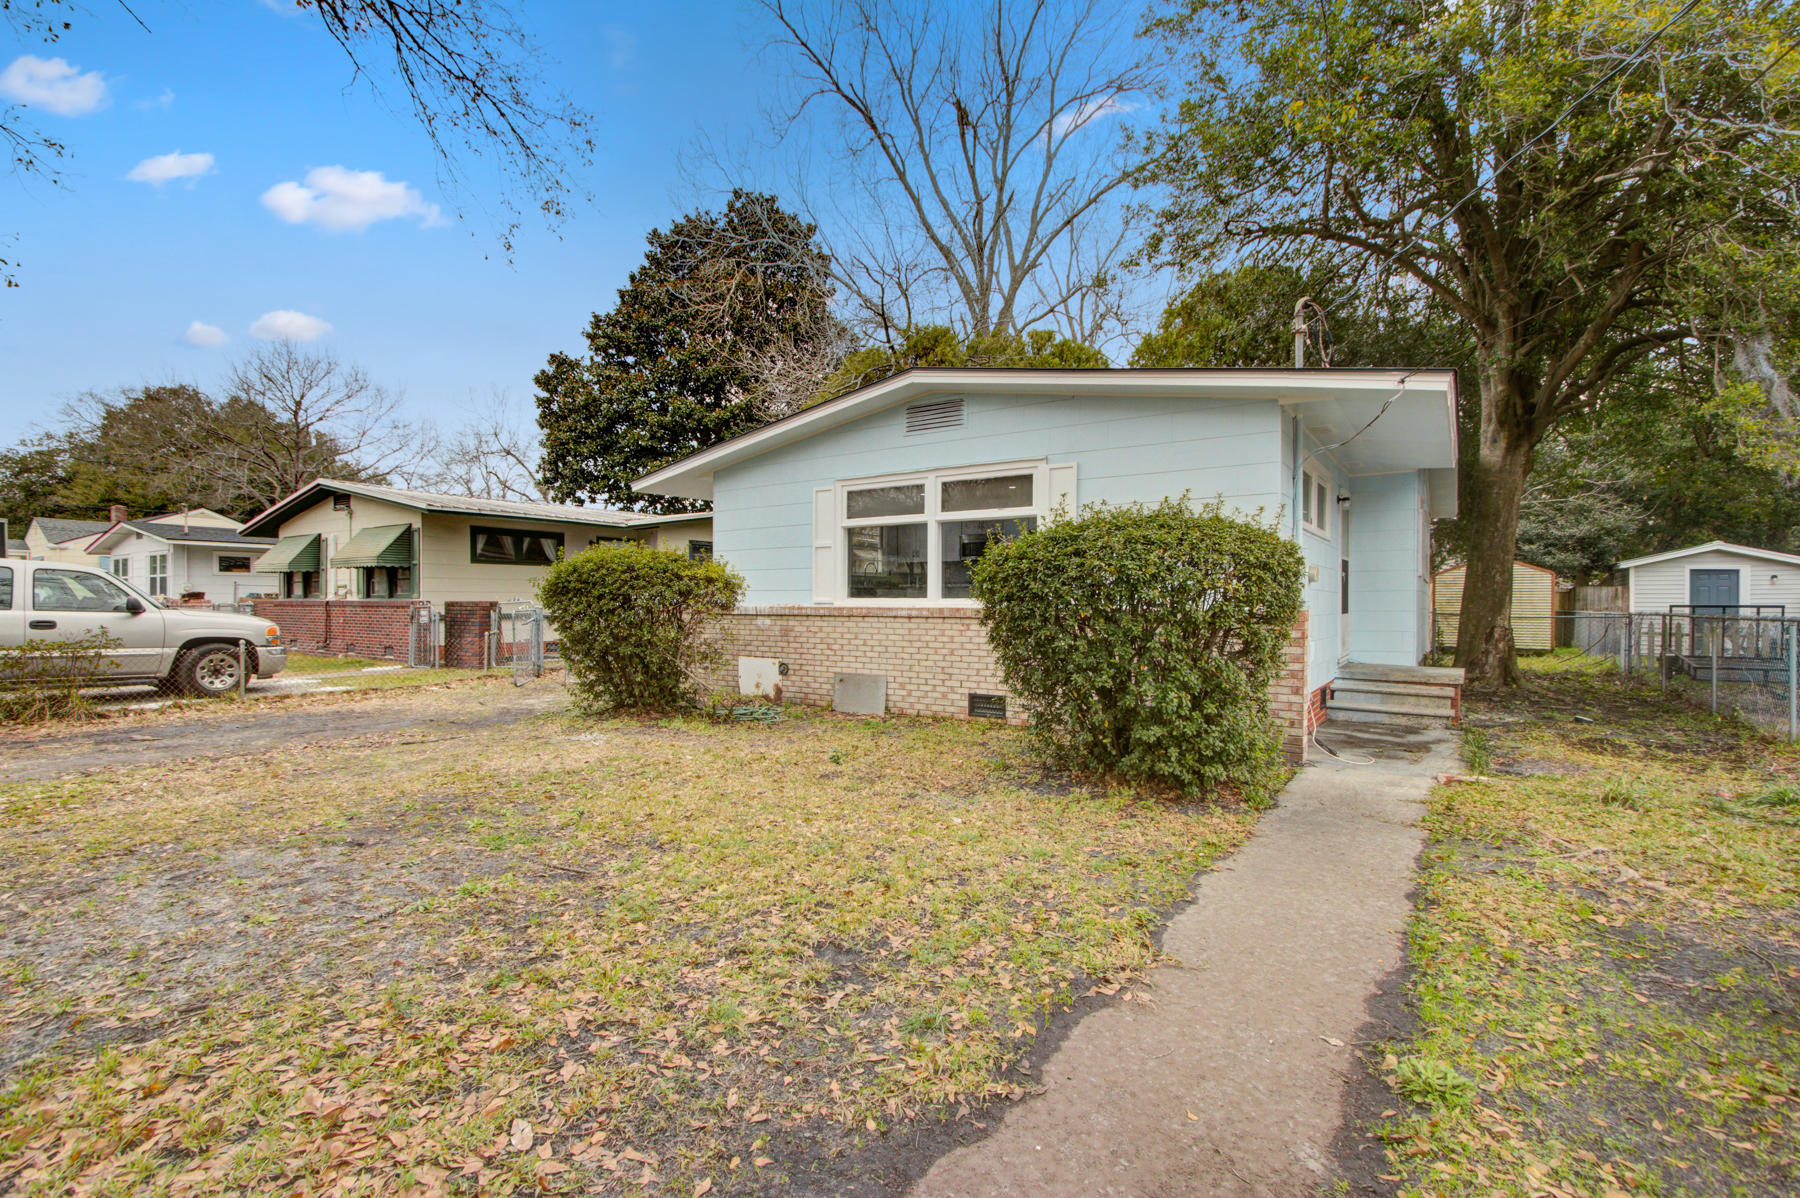 Port Park Homes For Sale - 5820 Sledge, Hanahan, SC - 6